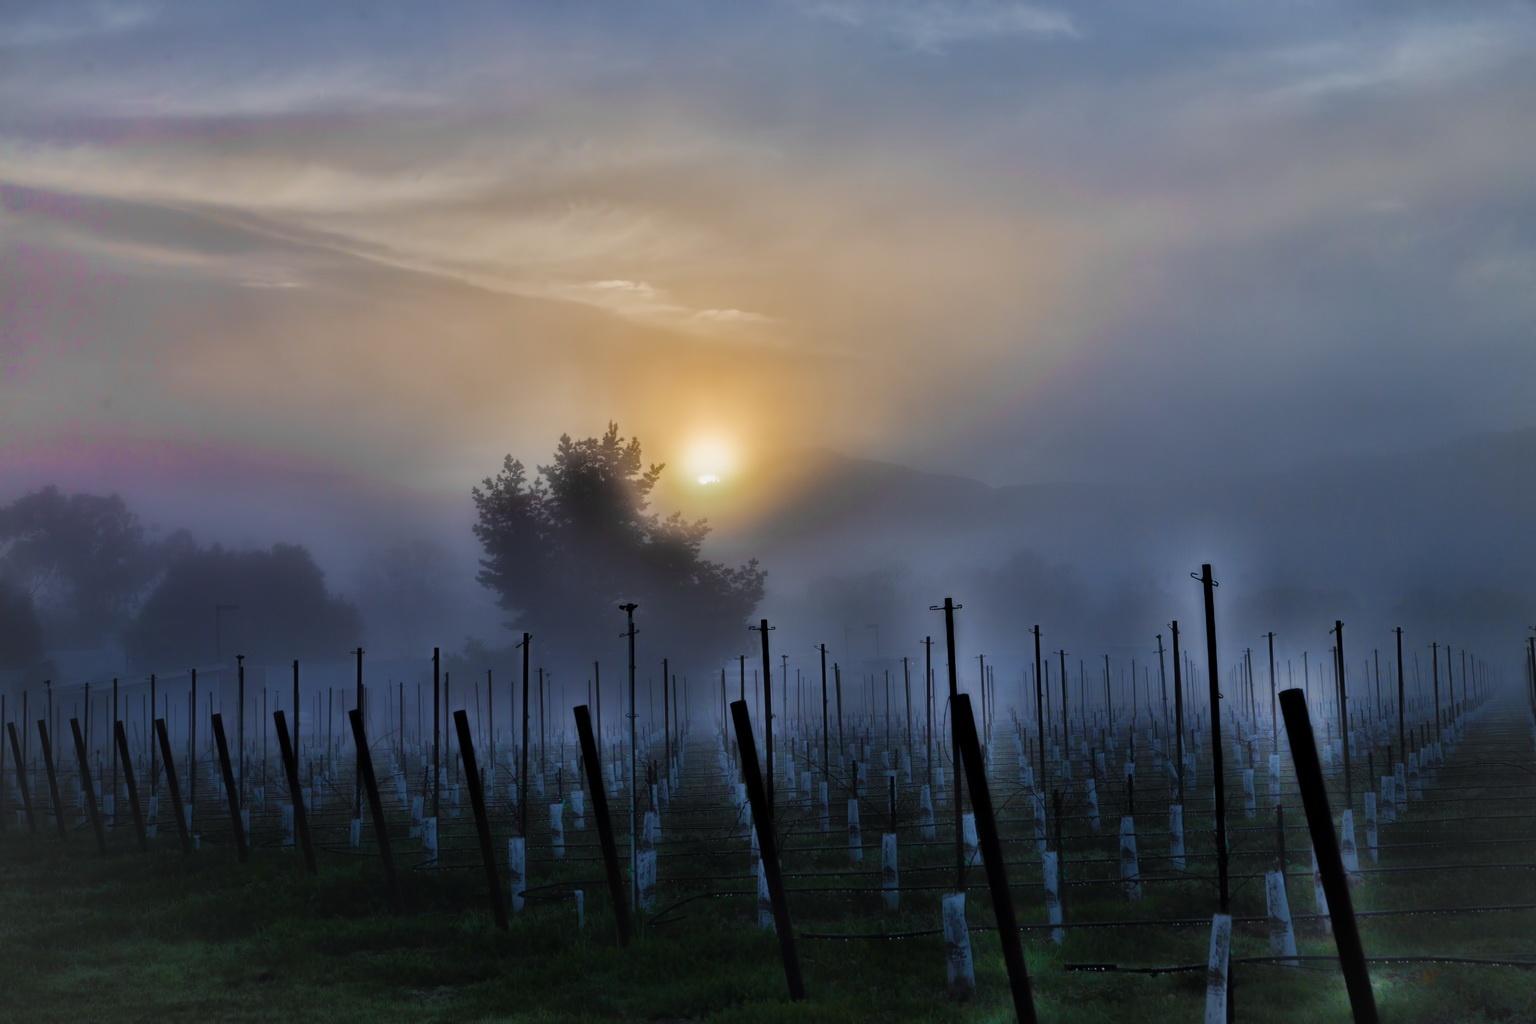 Mendocino vineyard by volkhard sturzbecher